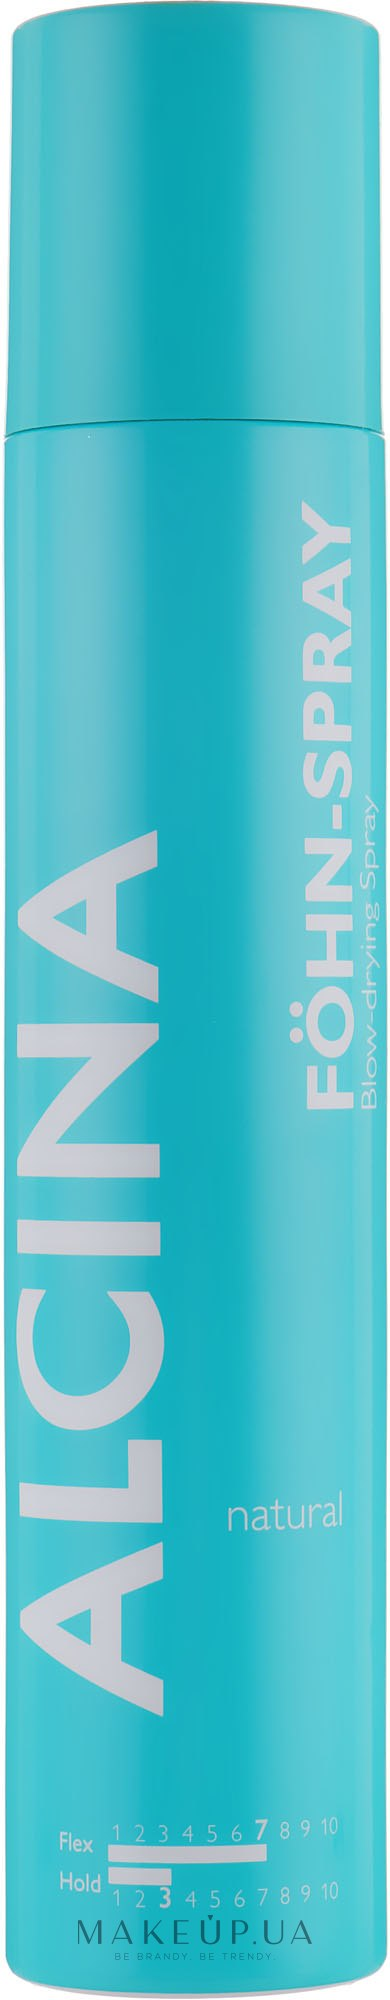 Спрей-аэрозоль для укладки феном - Alcina Styling Natural Föhn-Spray Spray — фото 200ml